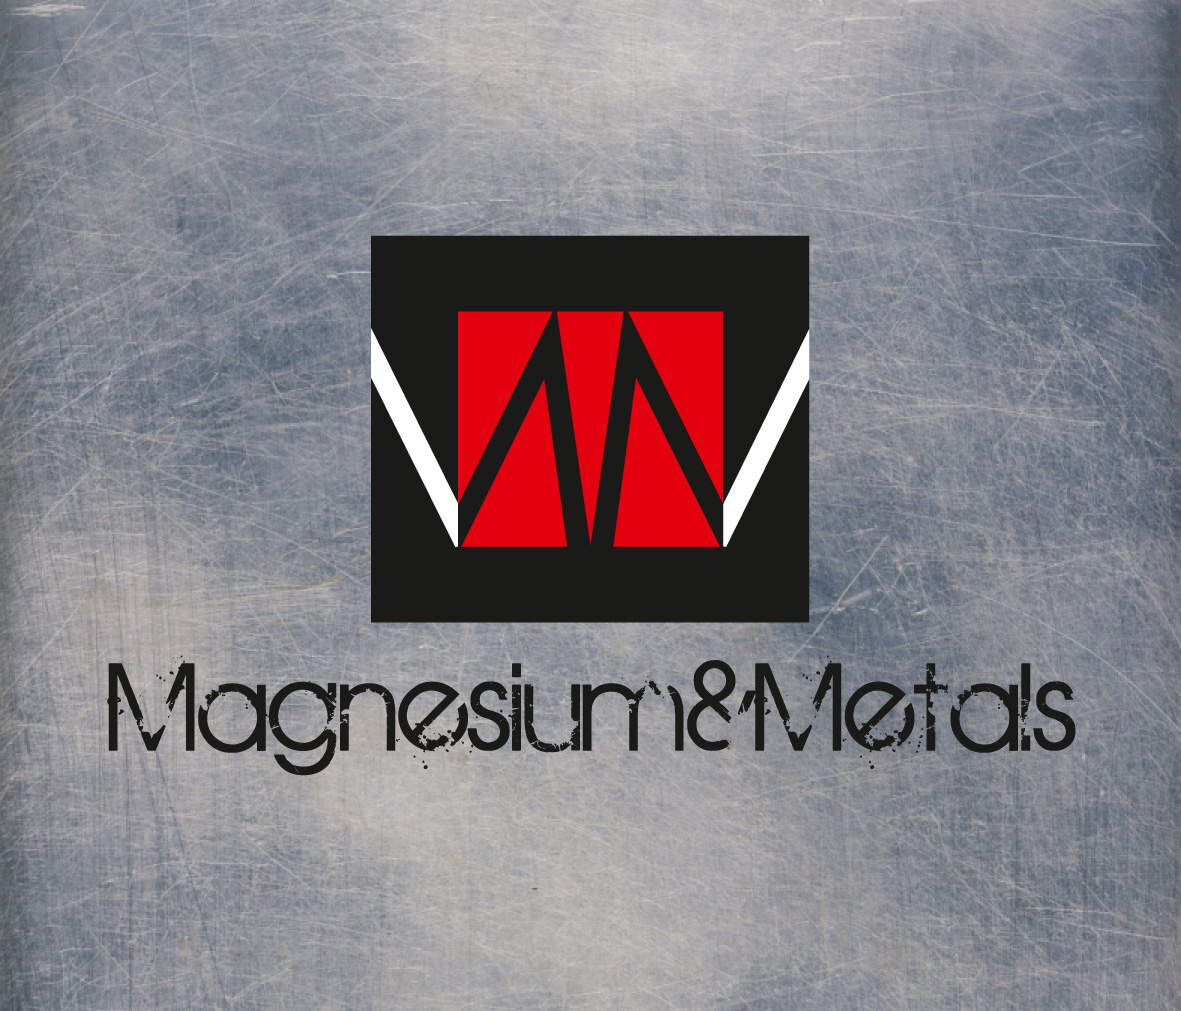 Логотип для проекта Magnesium&Metals фото f_4e92dda60f1b5.jpg